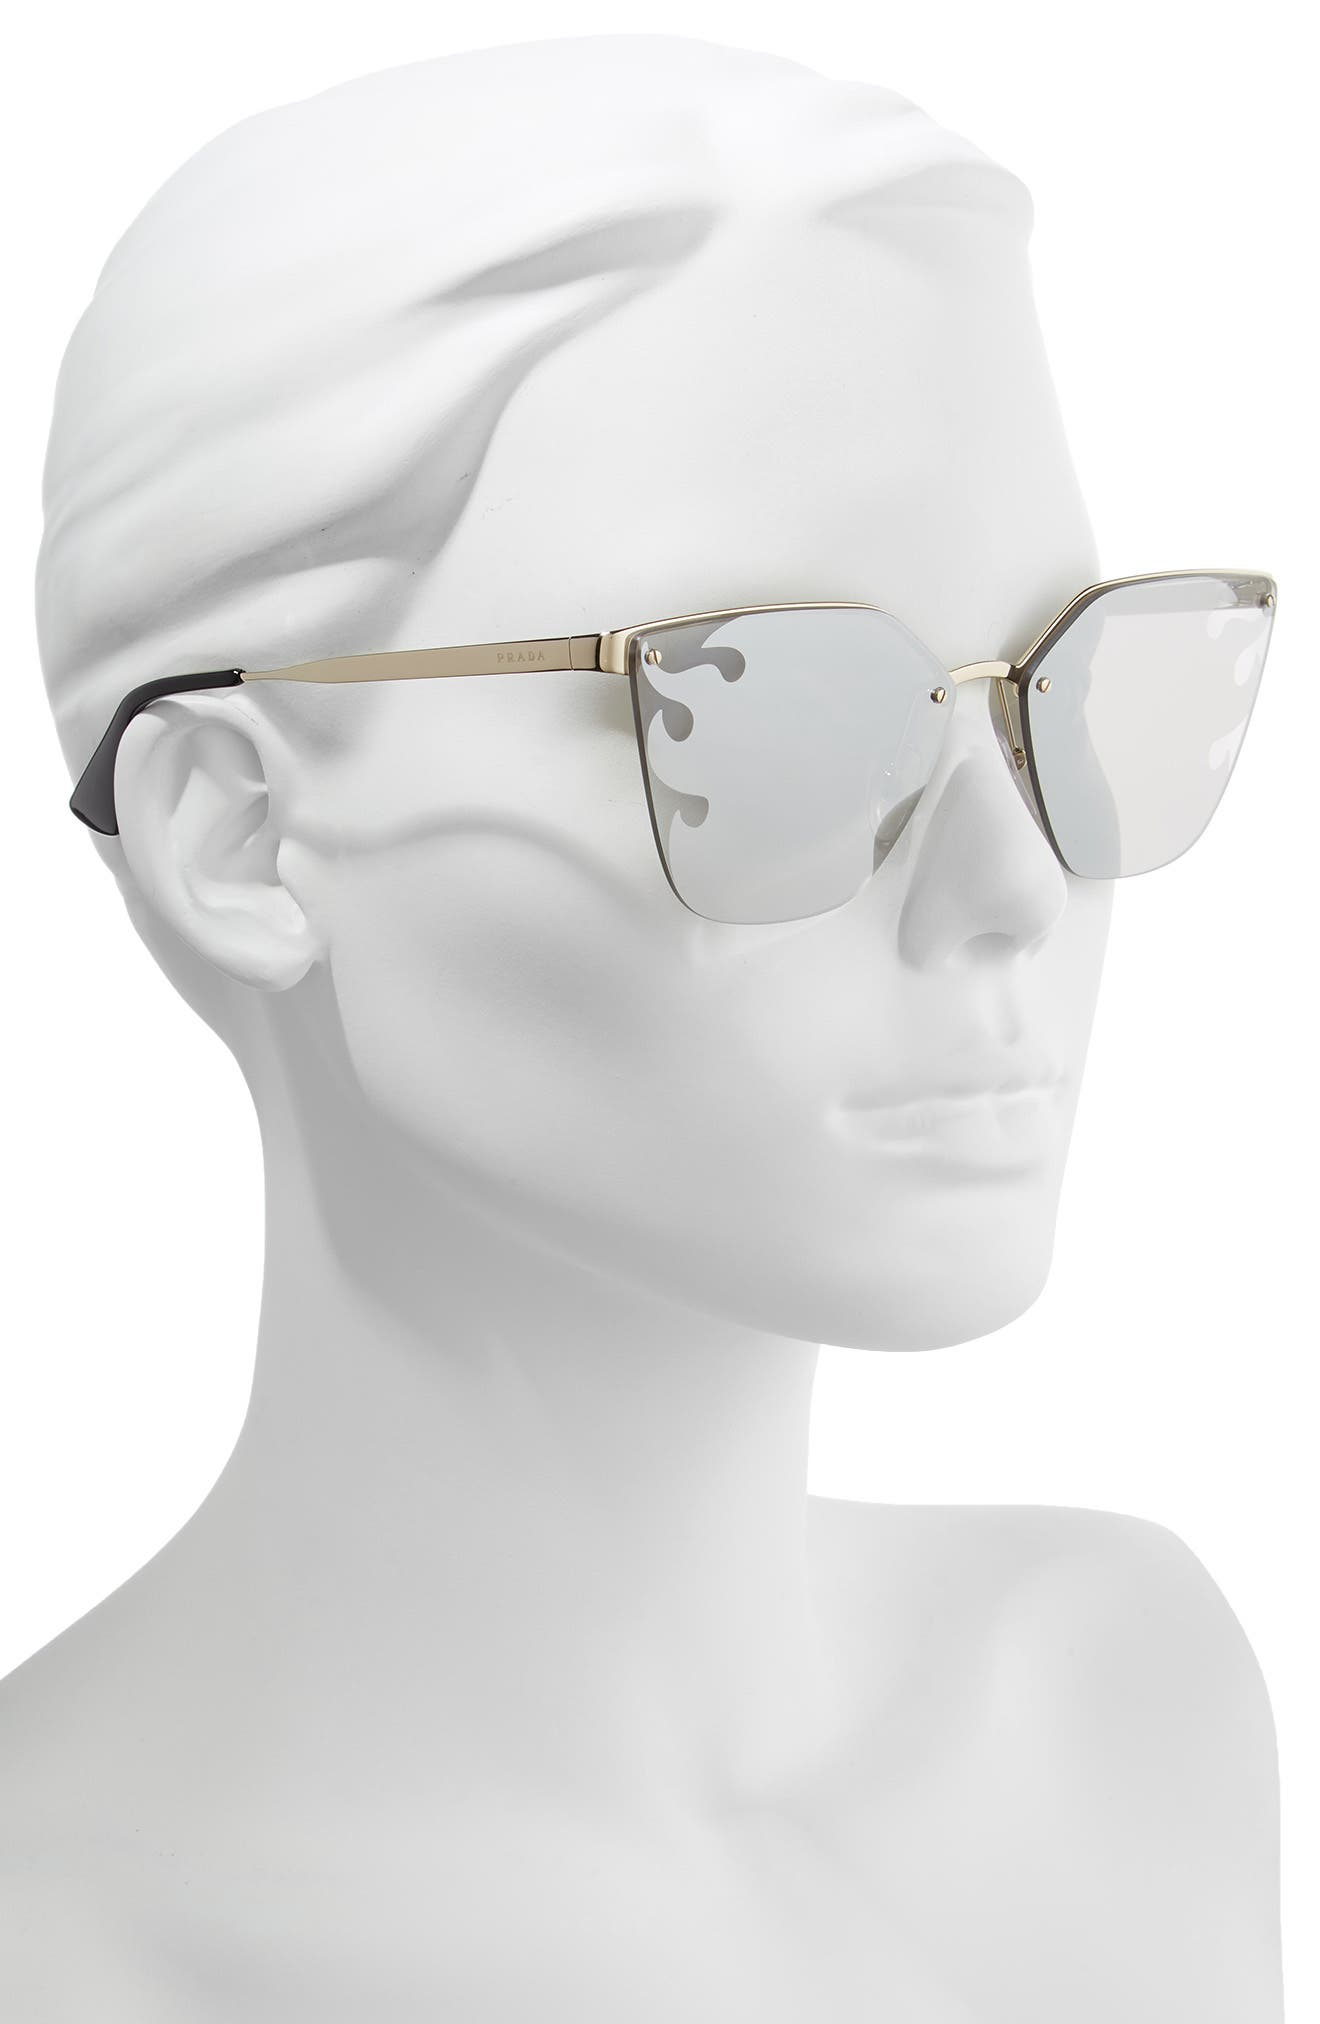 PRADA,                             Cinéma 63mm Oversize Rimless Sunglasses,                             Alternate thumbnail 2, color,                             GOLD/ GREY SILVER MIRROR